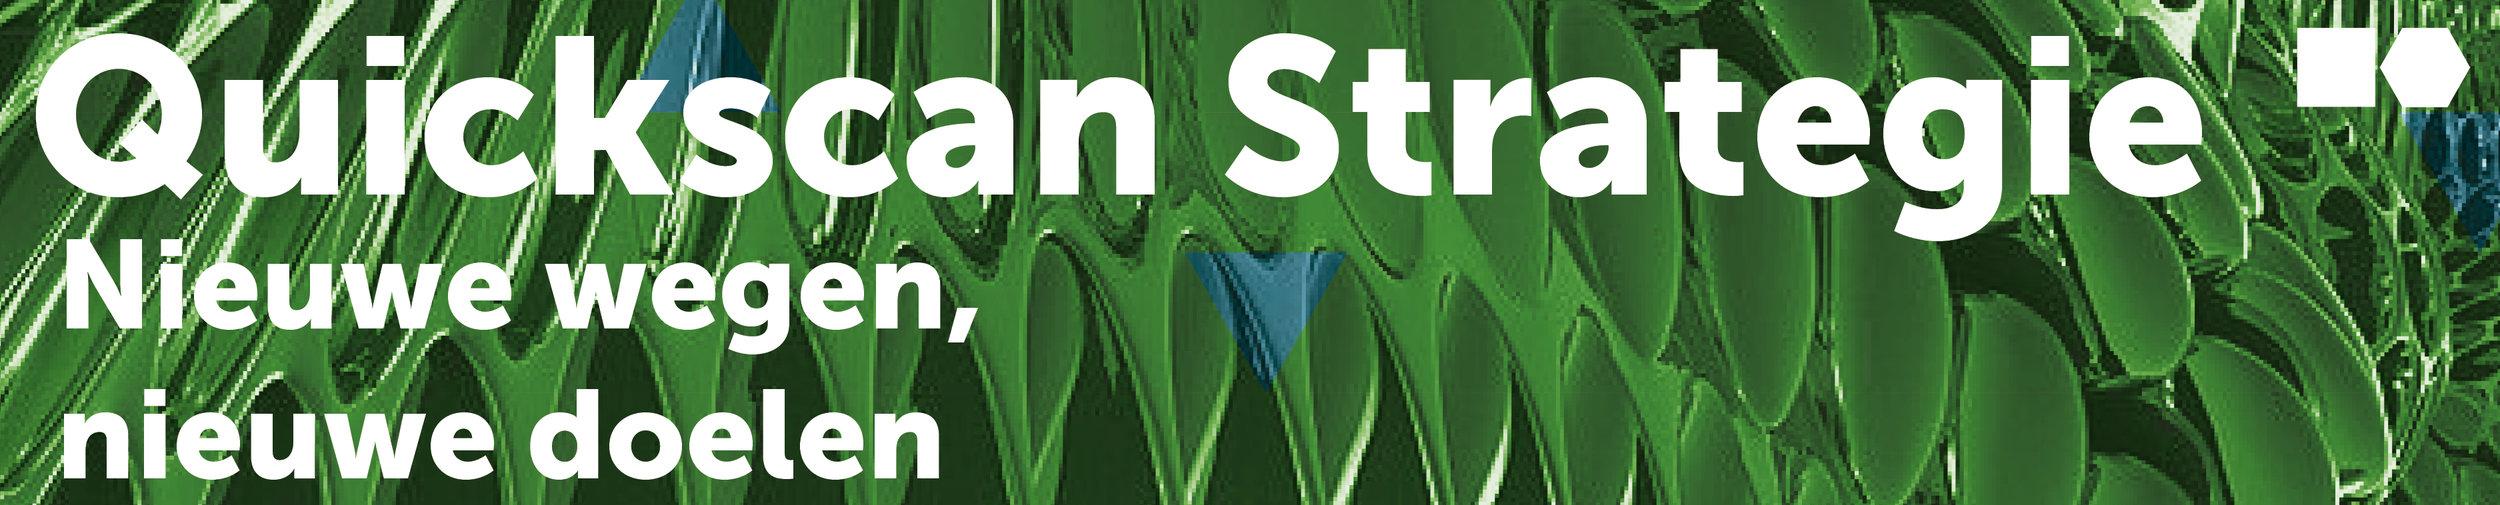 Banner-web4.jpg